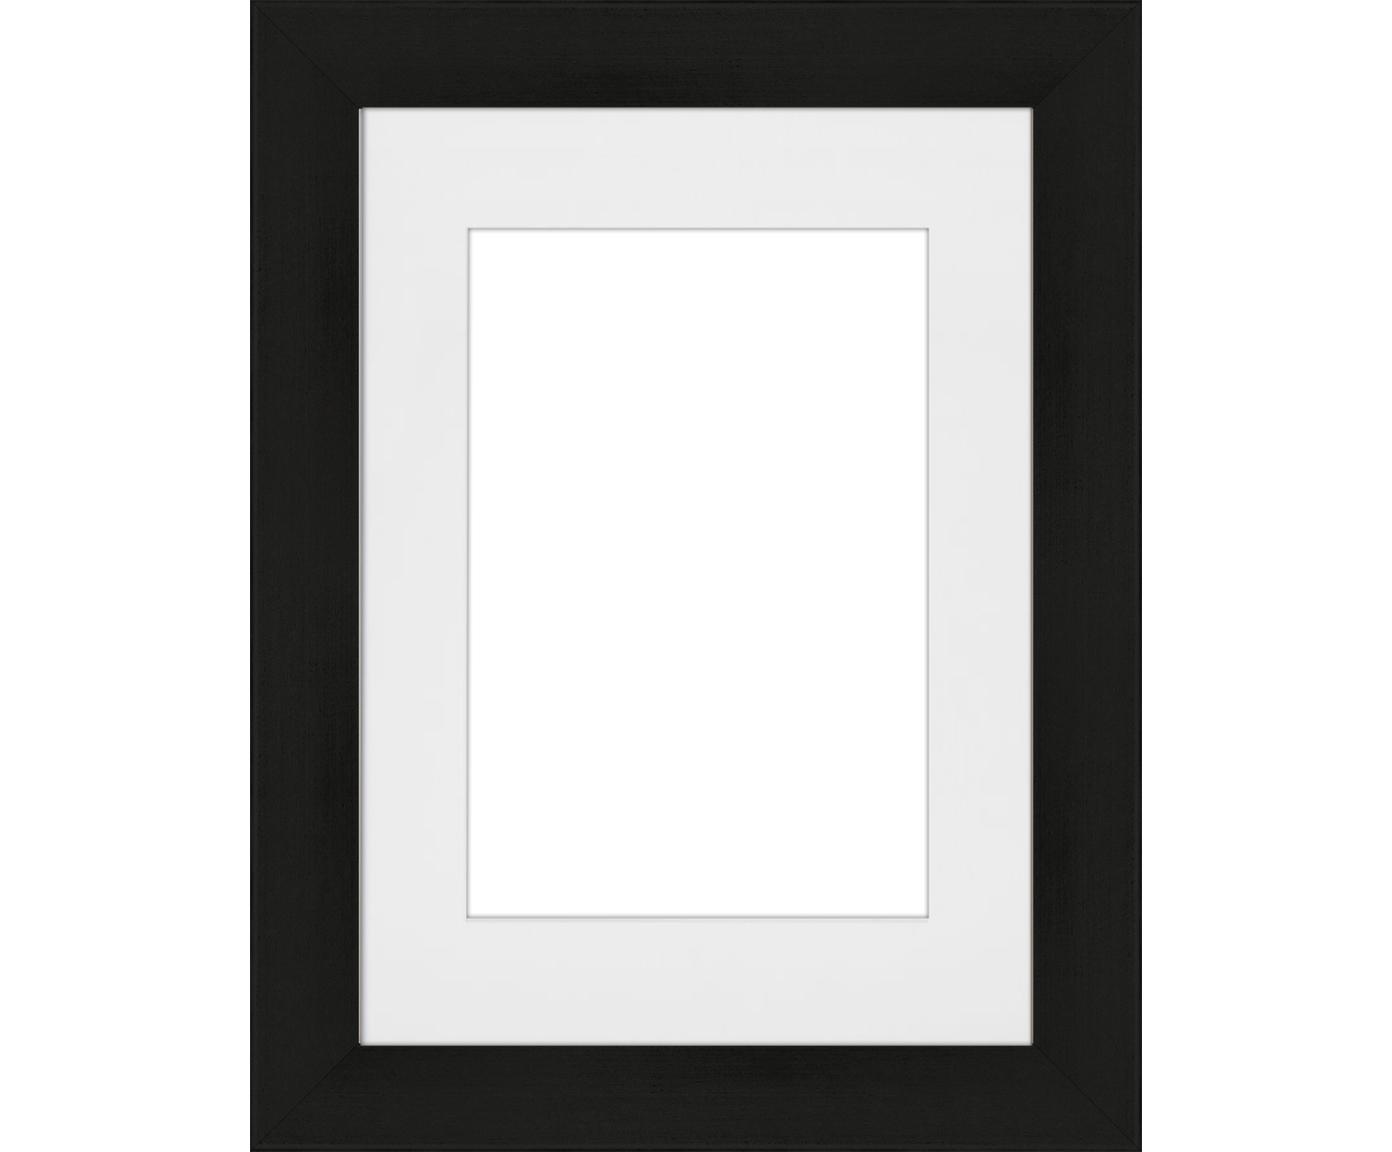 Bilderrahmen Apollon, Rahmen: Monterey-Kiefernholz, lac, Front: Glas, Rückseite: Mitteldichte Holzfaserpla, Schwarz, 13 x 18 cm